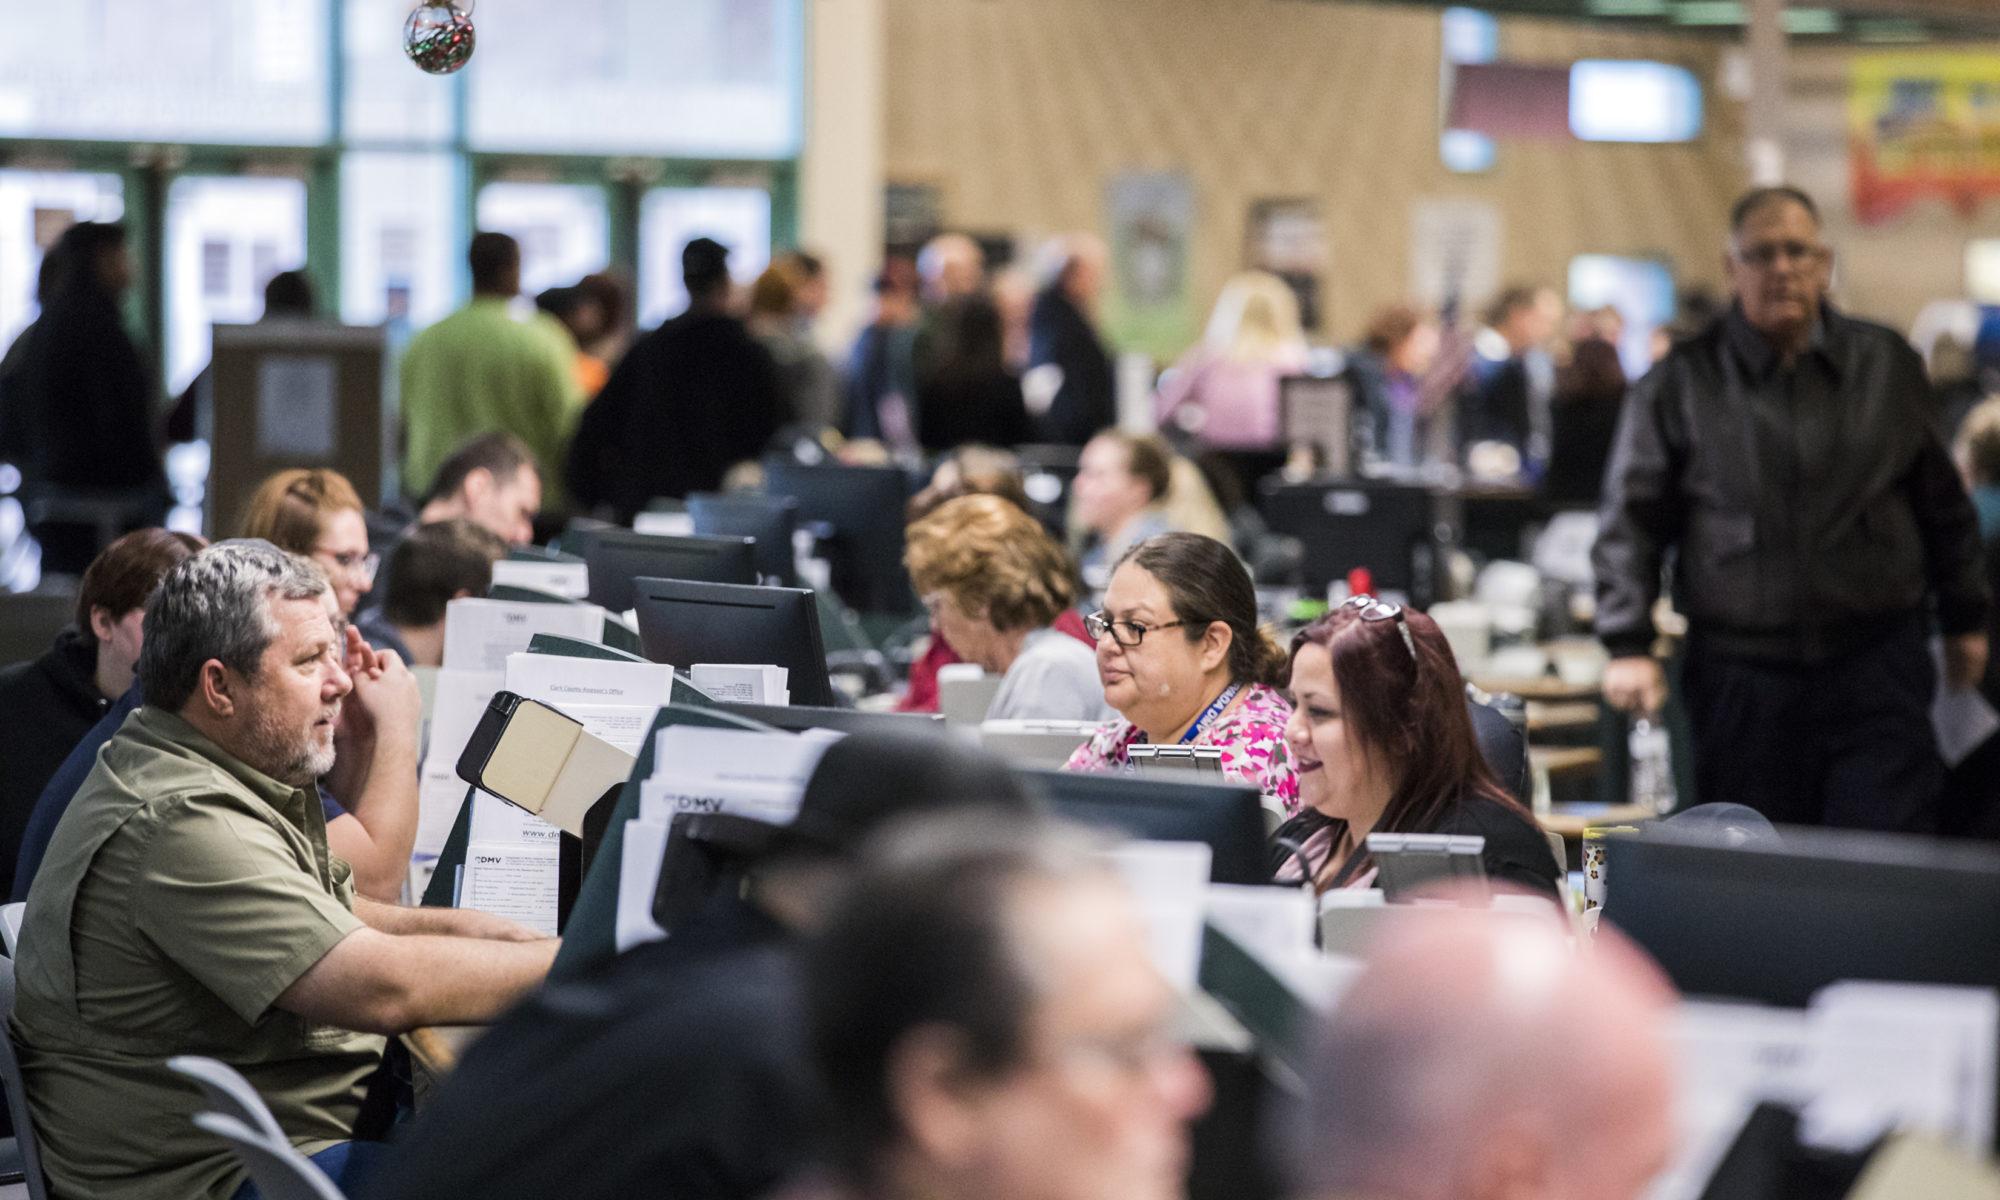 Customers at DMV